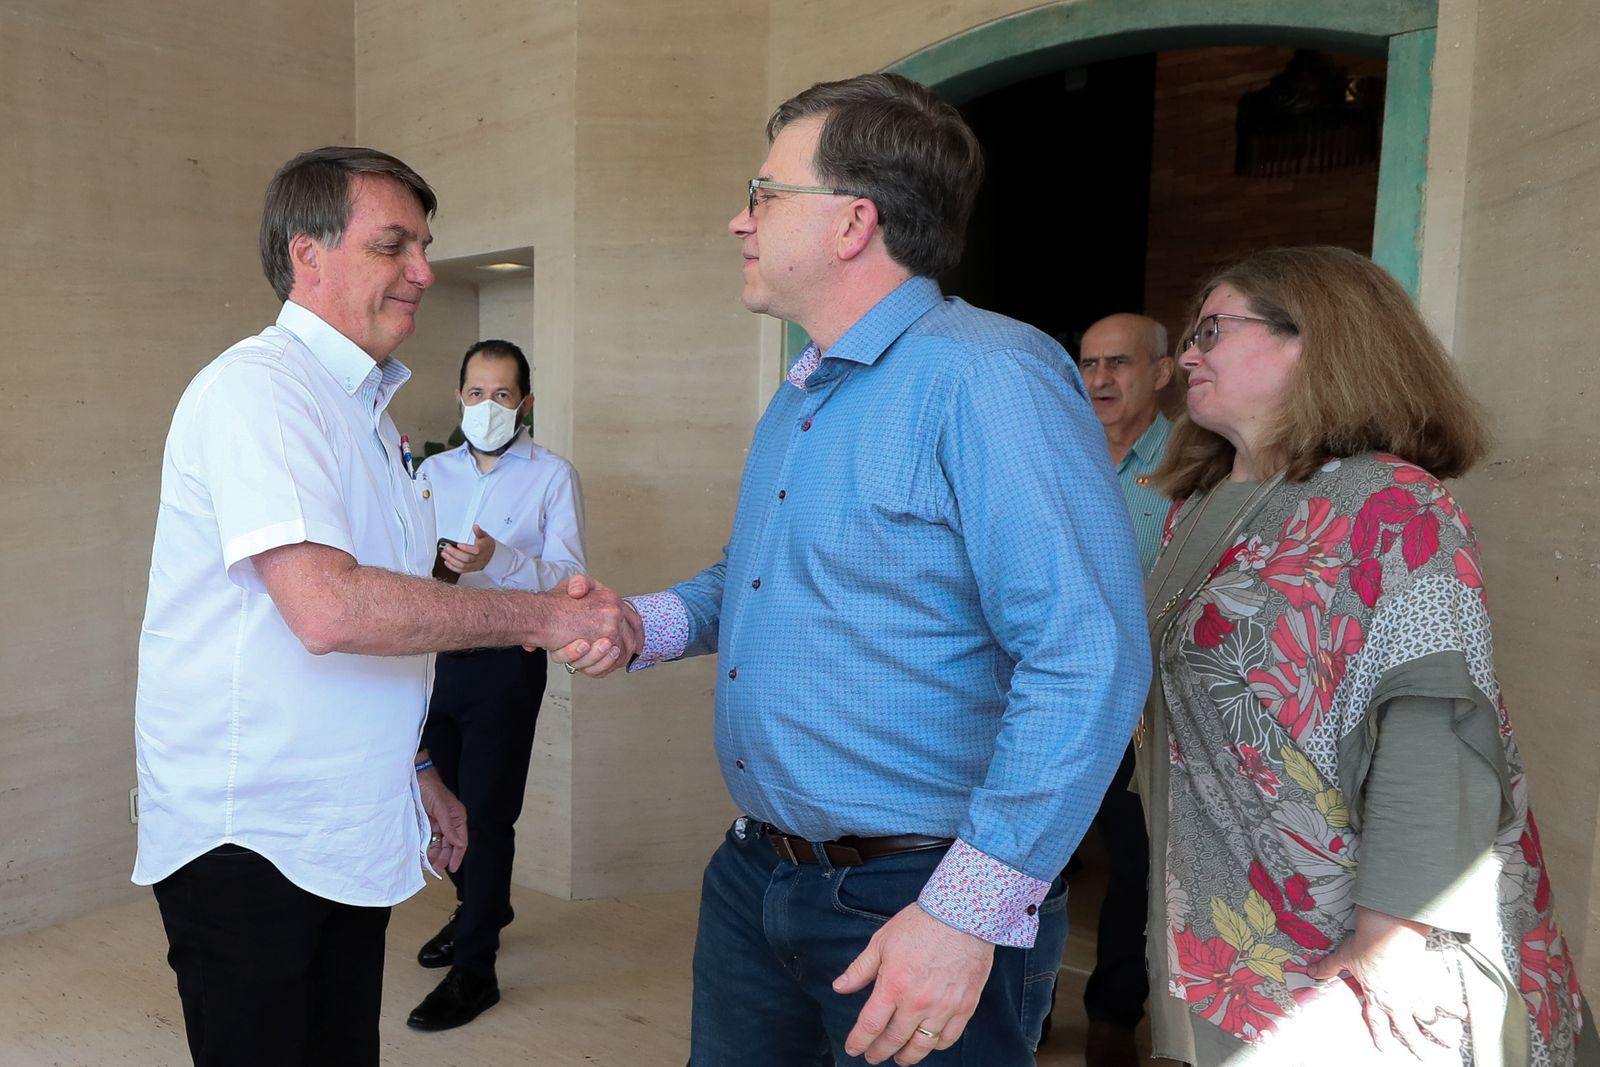 Brazil's President Jair Bolsonaro greets U.S. Ambassador Todd Chapman during a meeting in Brasilia